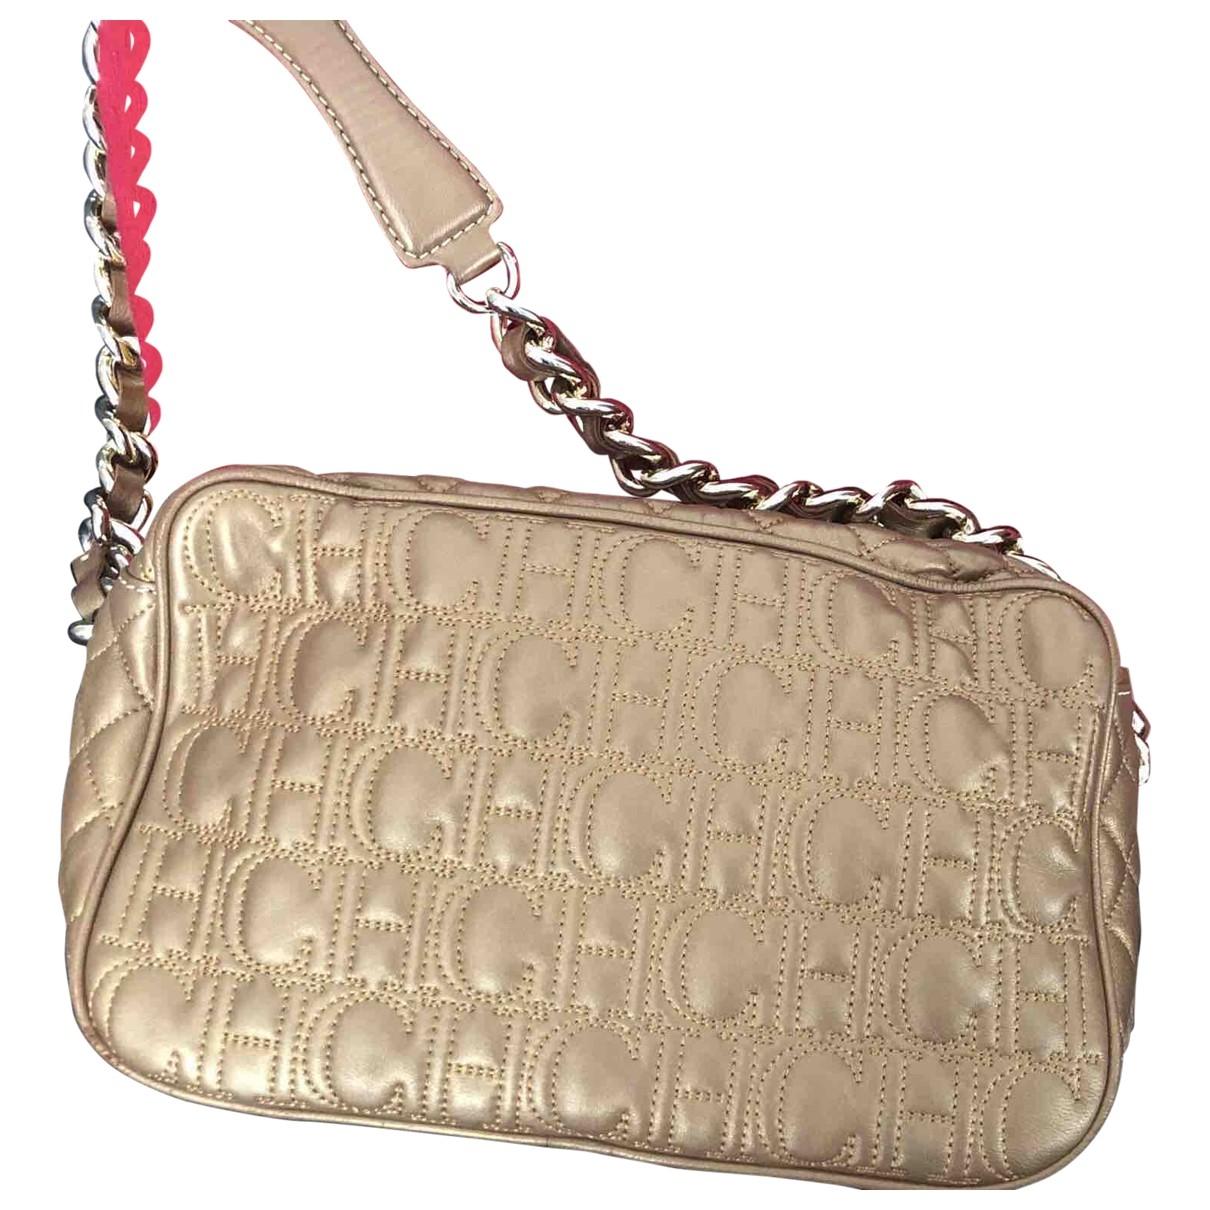 Carolina Herrera \N Gold Leather handbag for Women \N